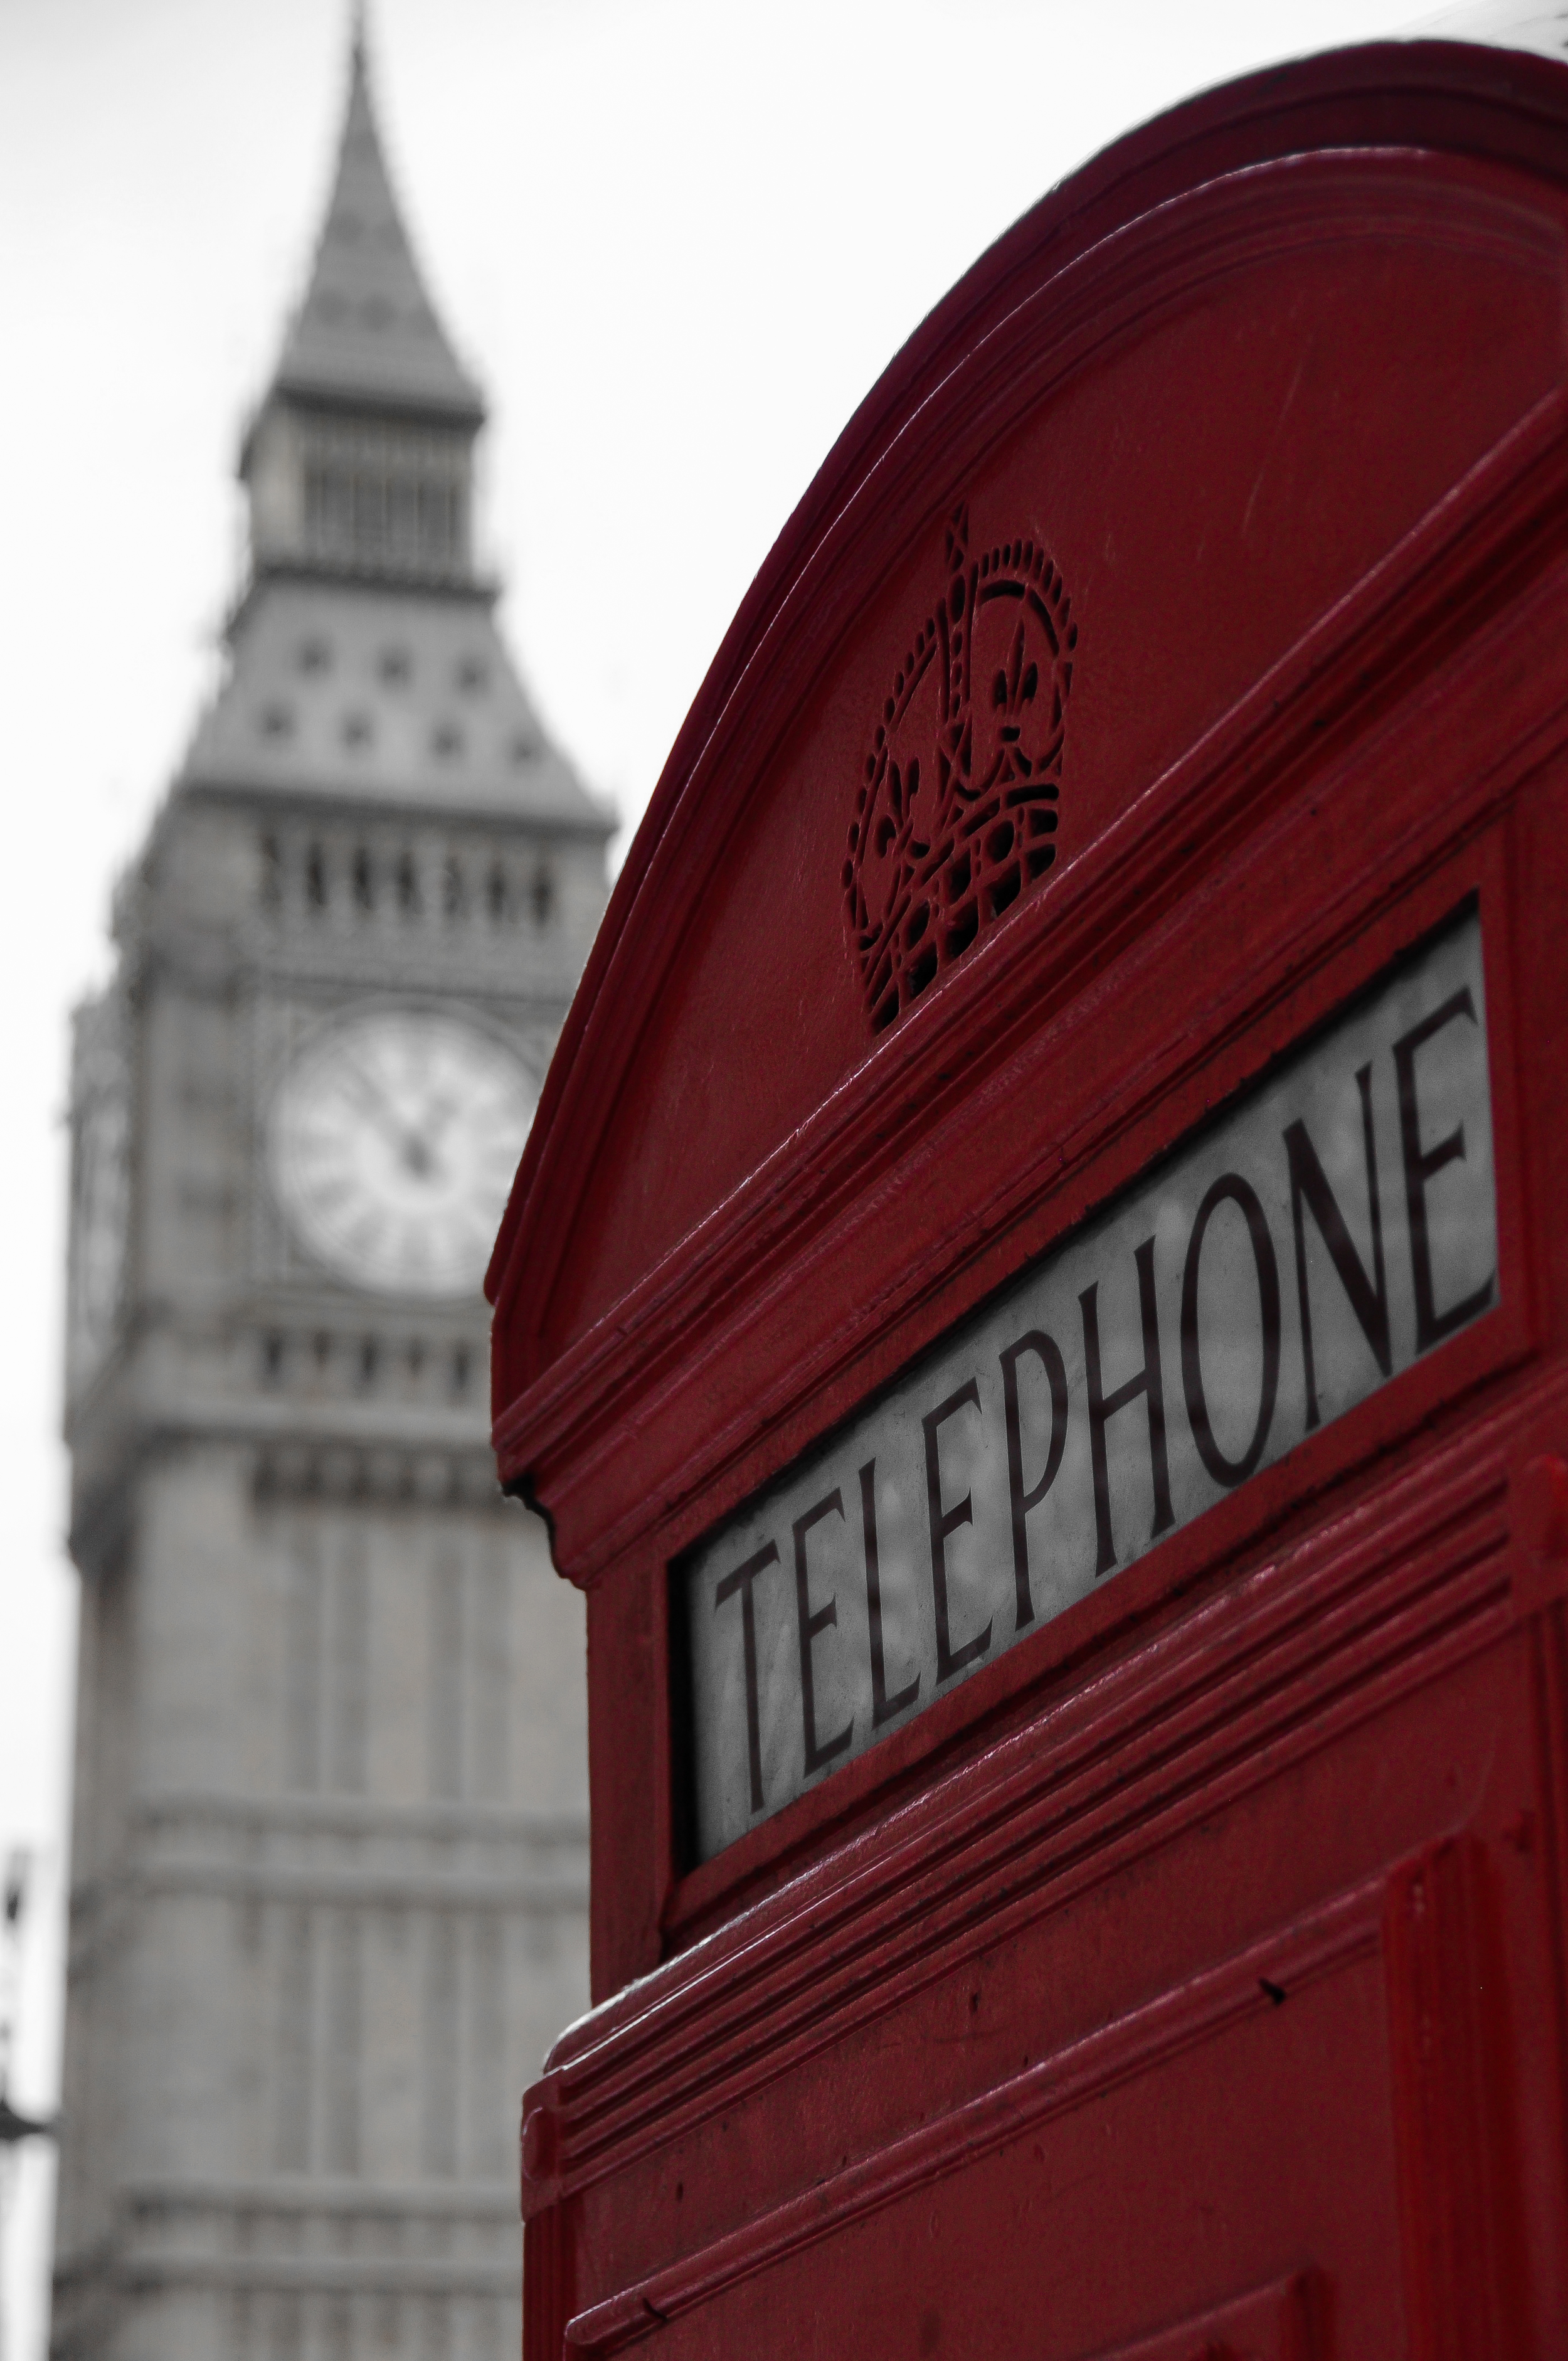 London Calling - Phone Booth/Big Ben (London, England))